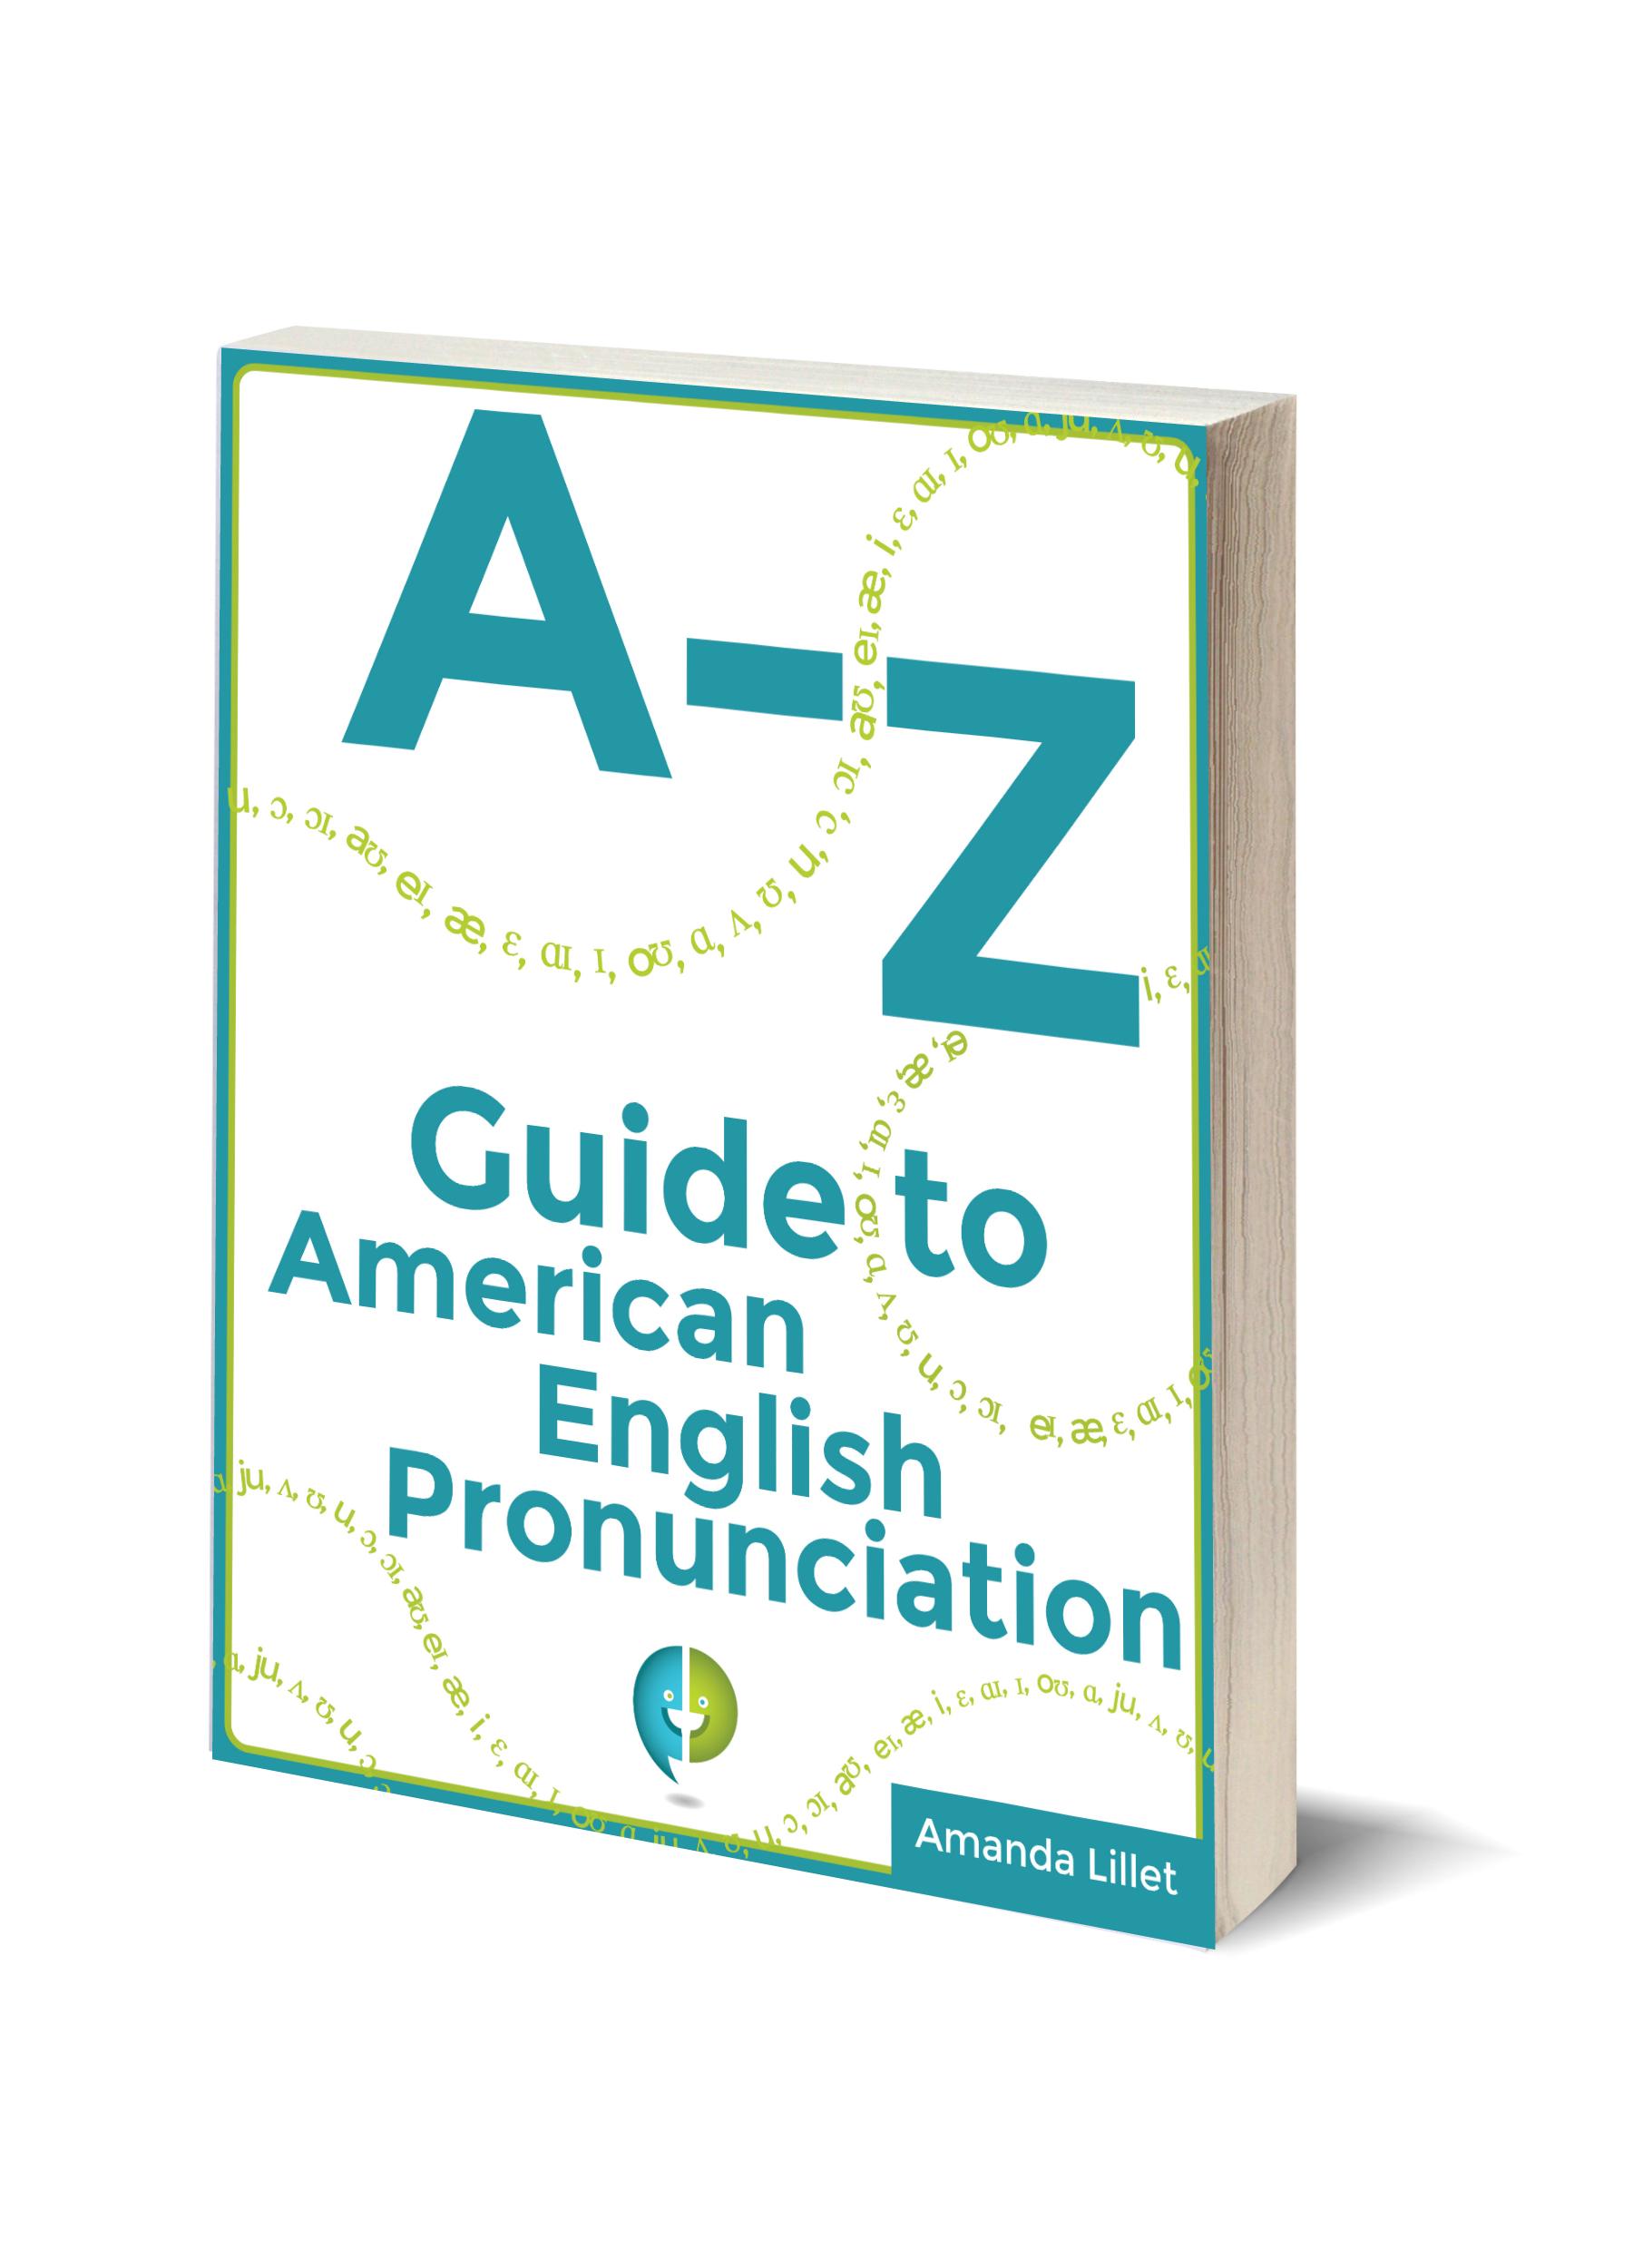 Amanda Lillet's English Pronunciation Guide